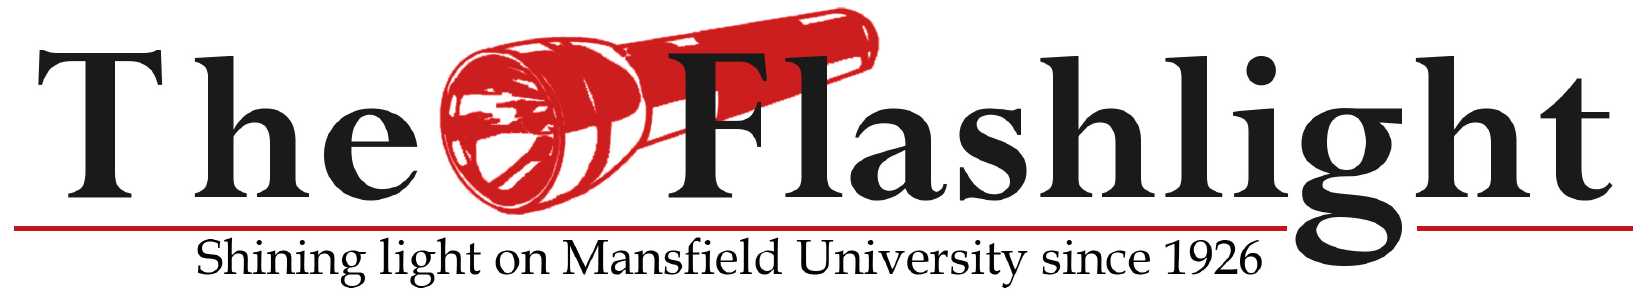 The Flashlight: Shining light on Mansfield University since 1926